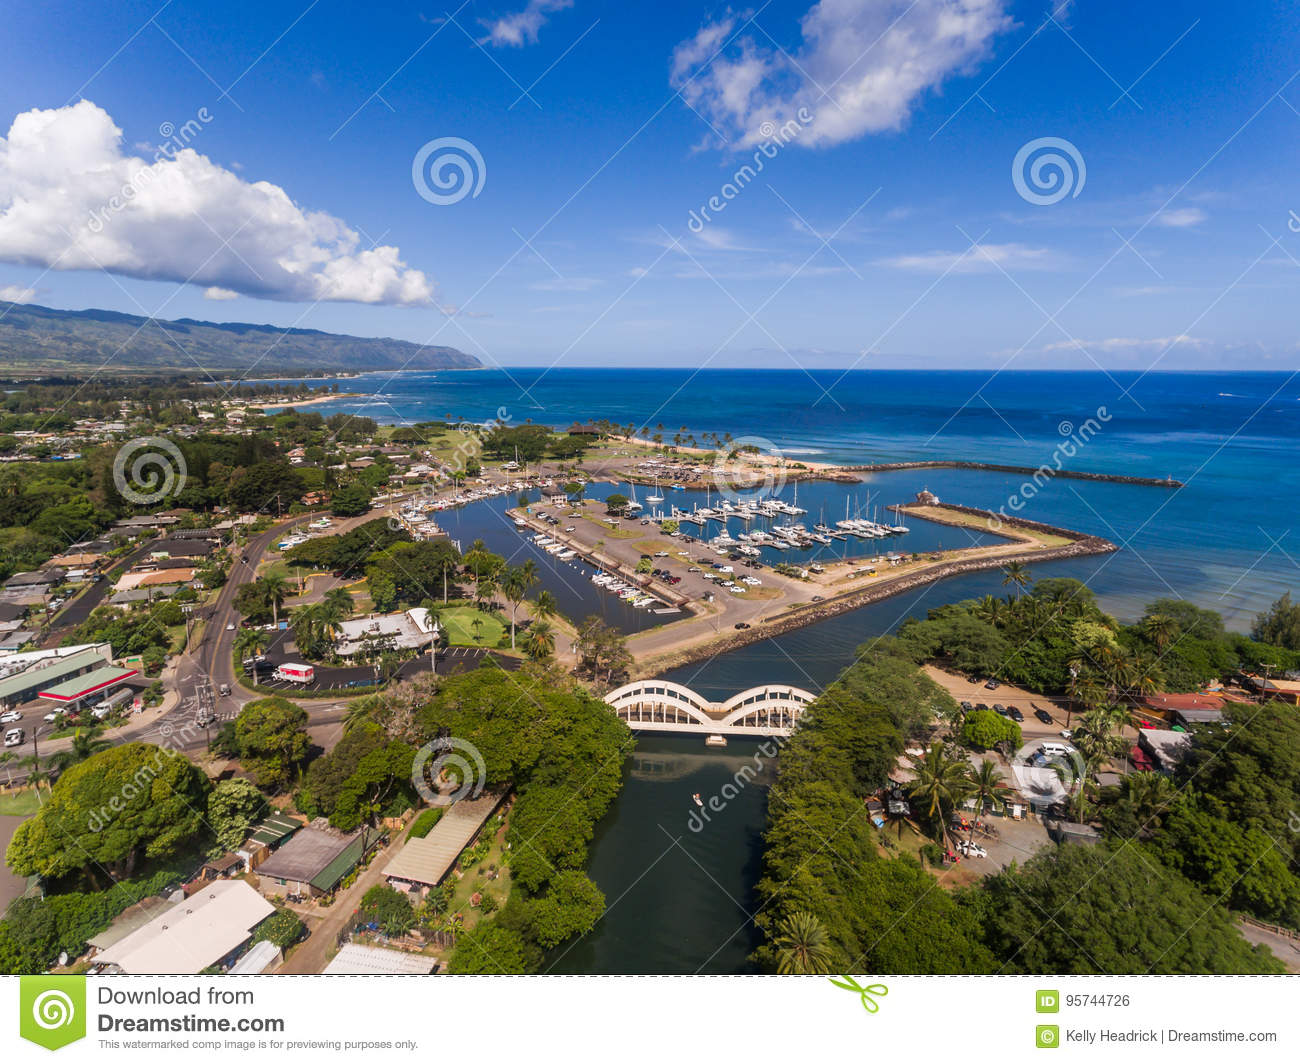 Name:  aerial-view-haleiwa-town-harbor-small-boat-anahulu-river-bridge-95744726.jpg Views: 925 Size:  241.9 KB